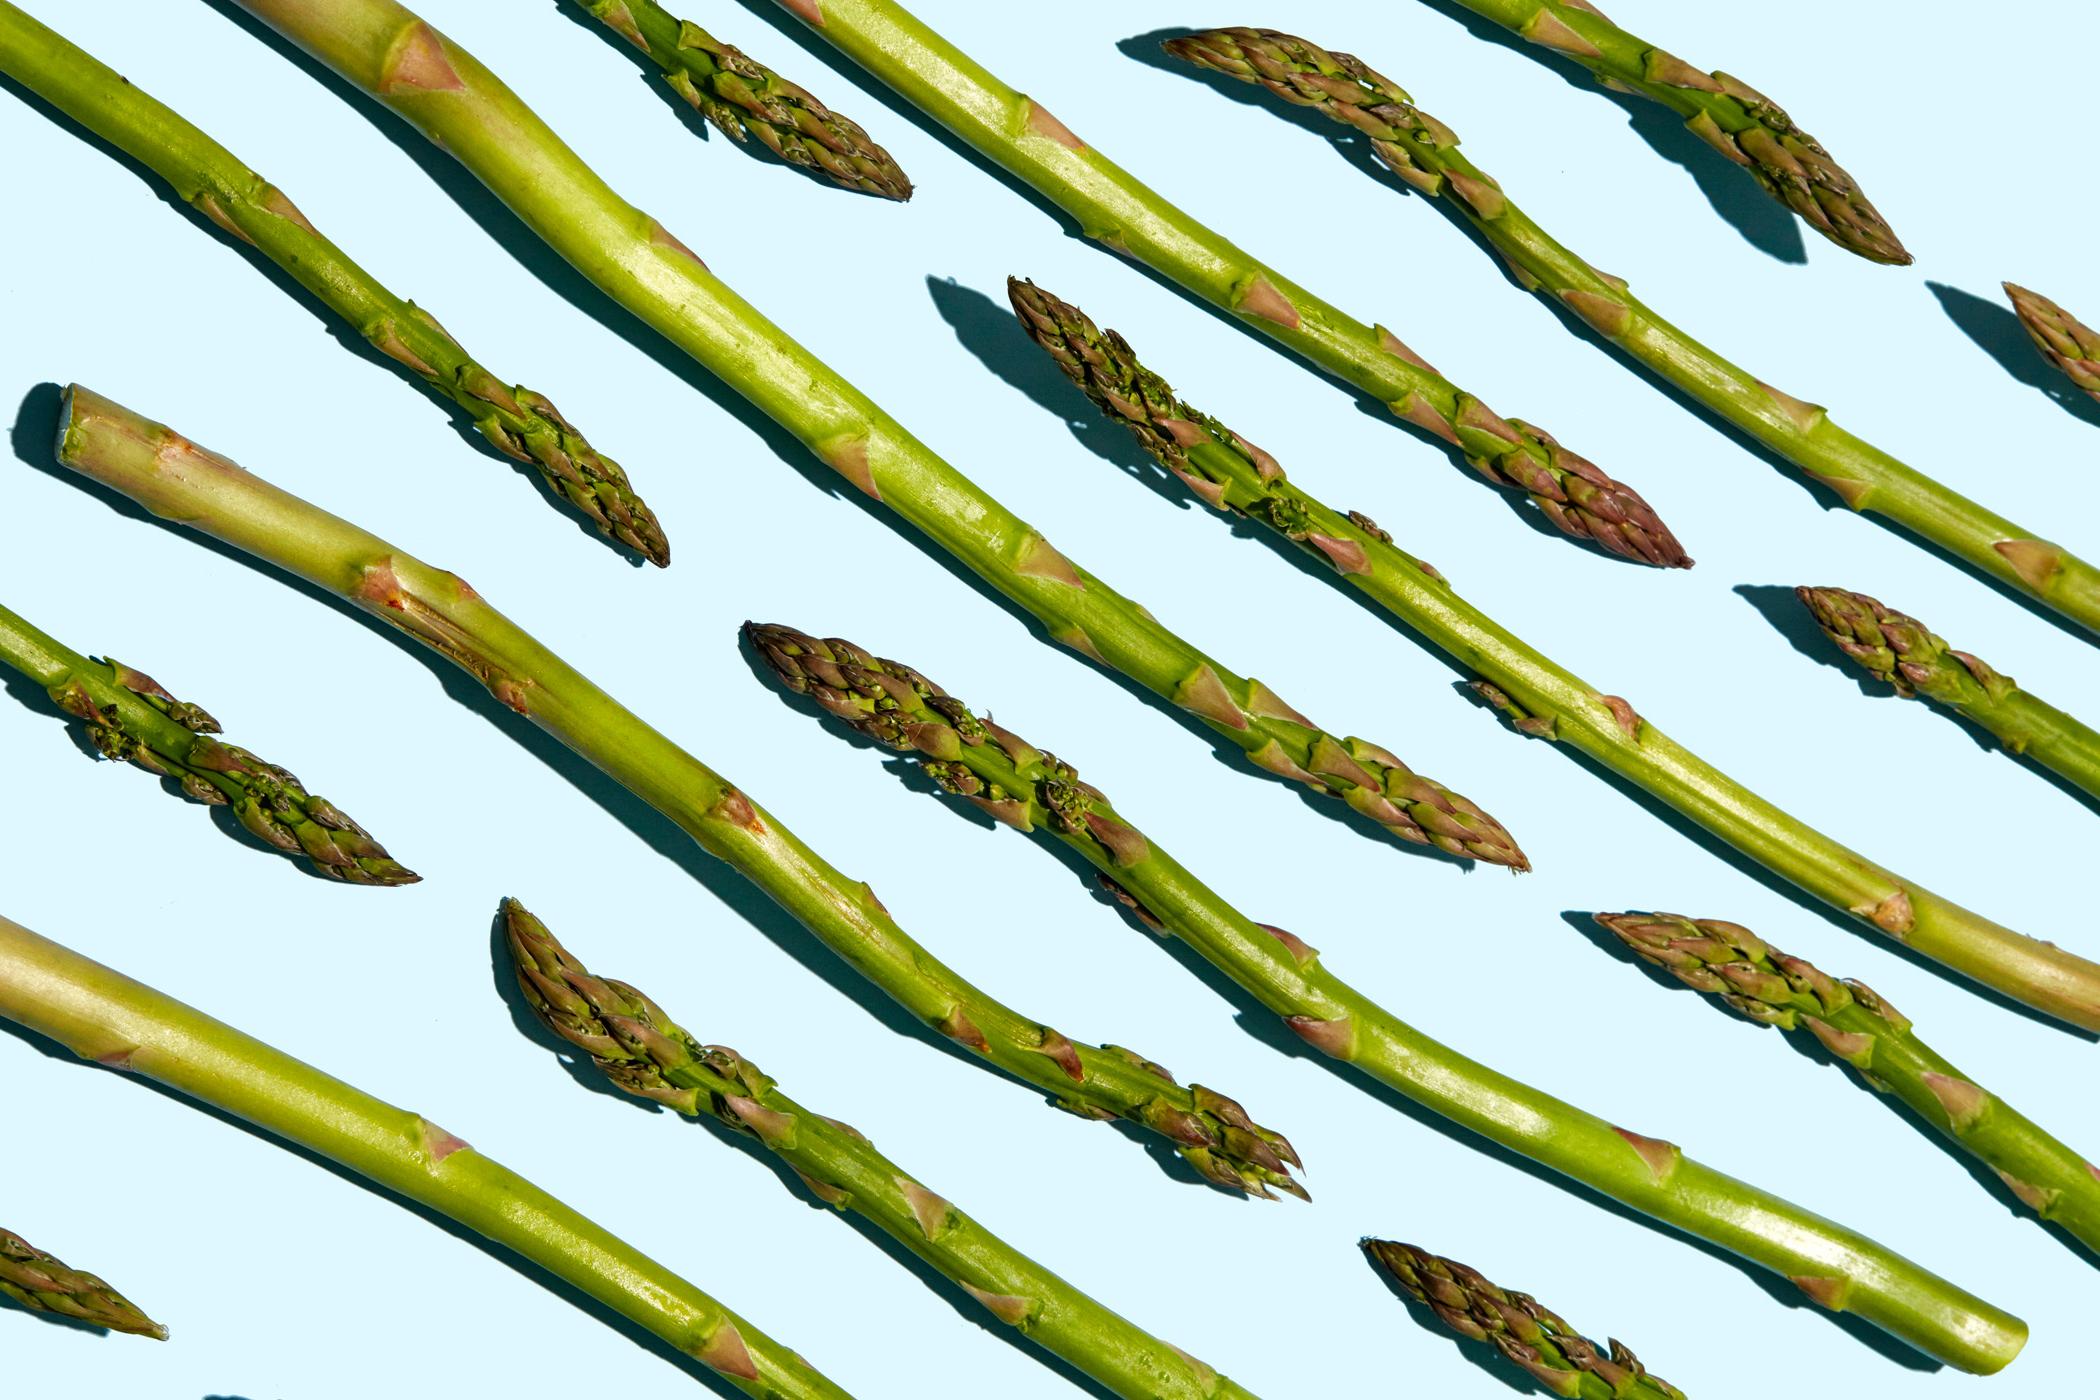 healthiest foods, health food, diet, nutrition, time.com stock, asparagus